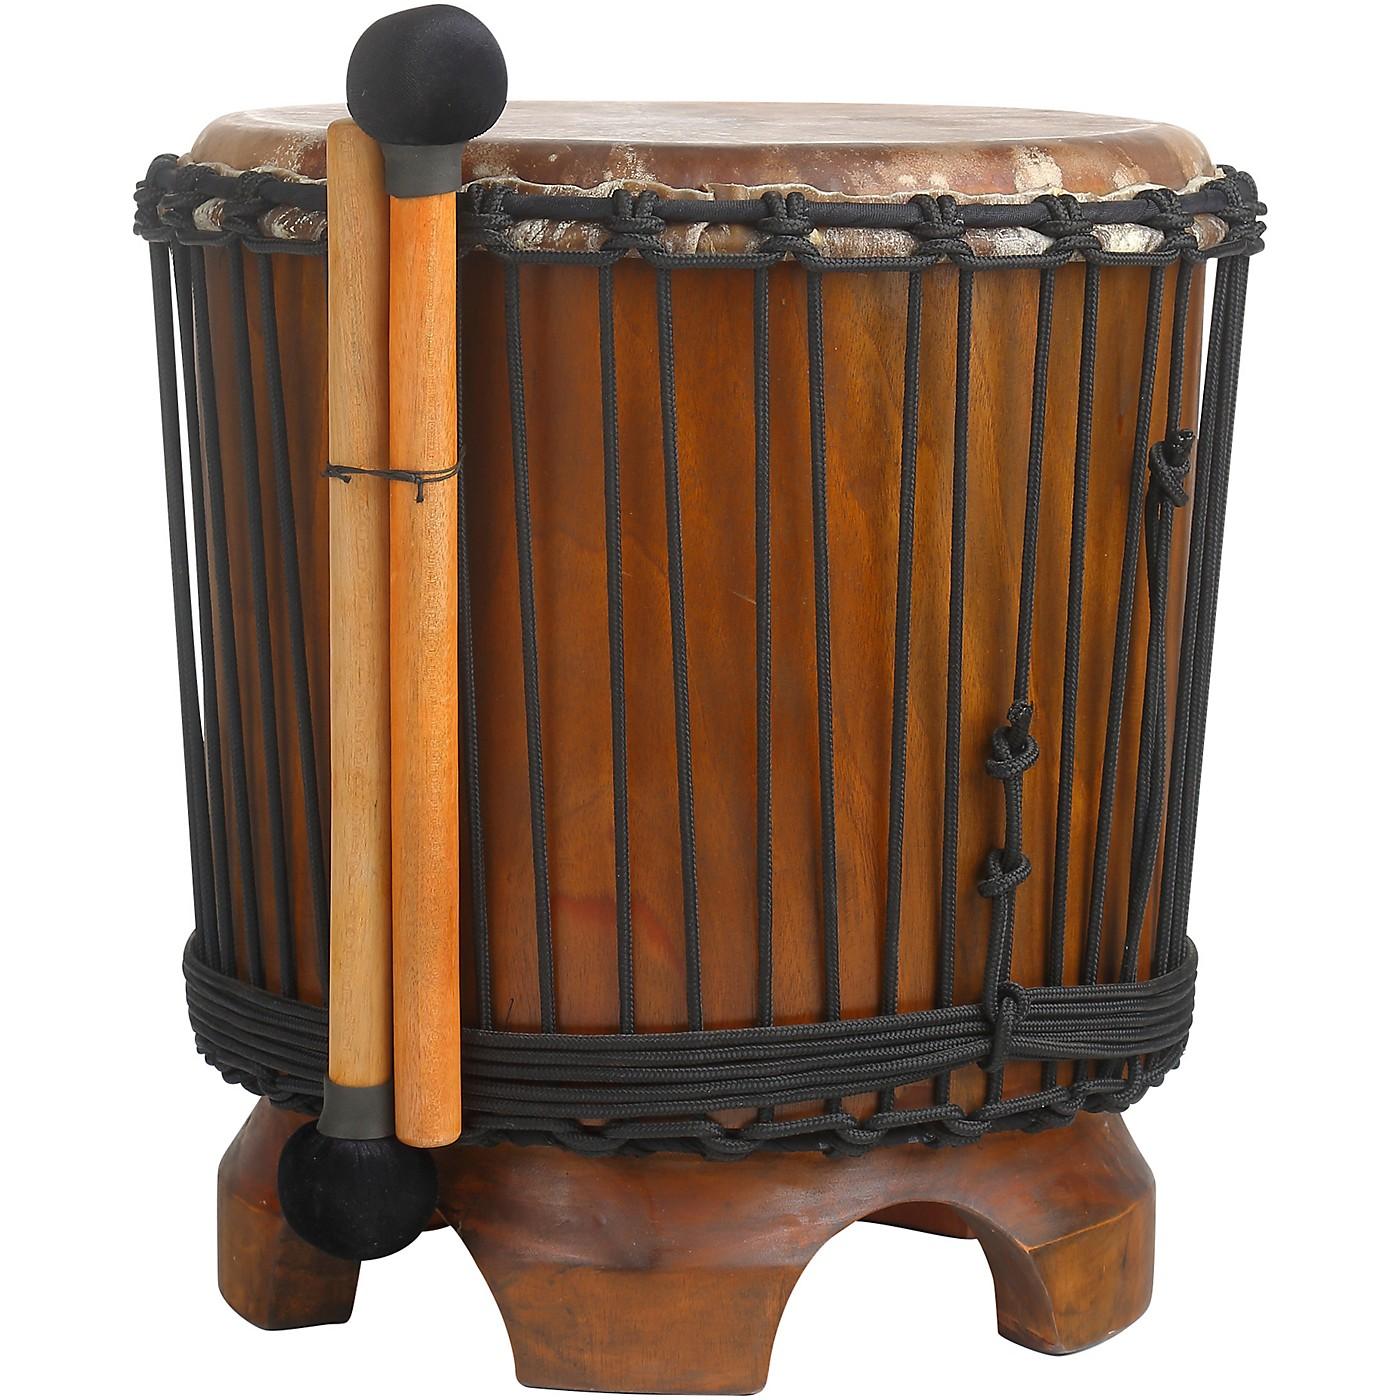 X8 Drums Table Drum thumbnail